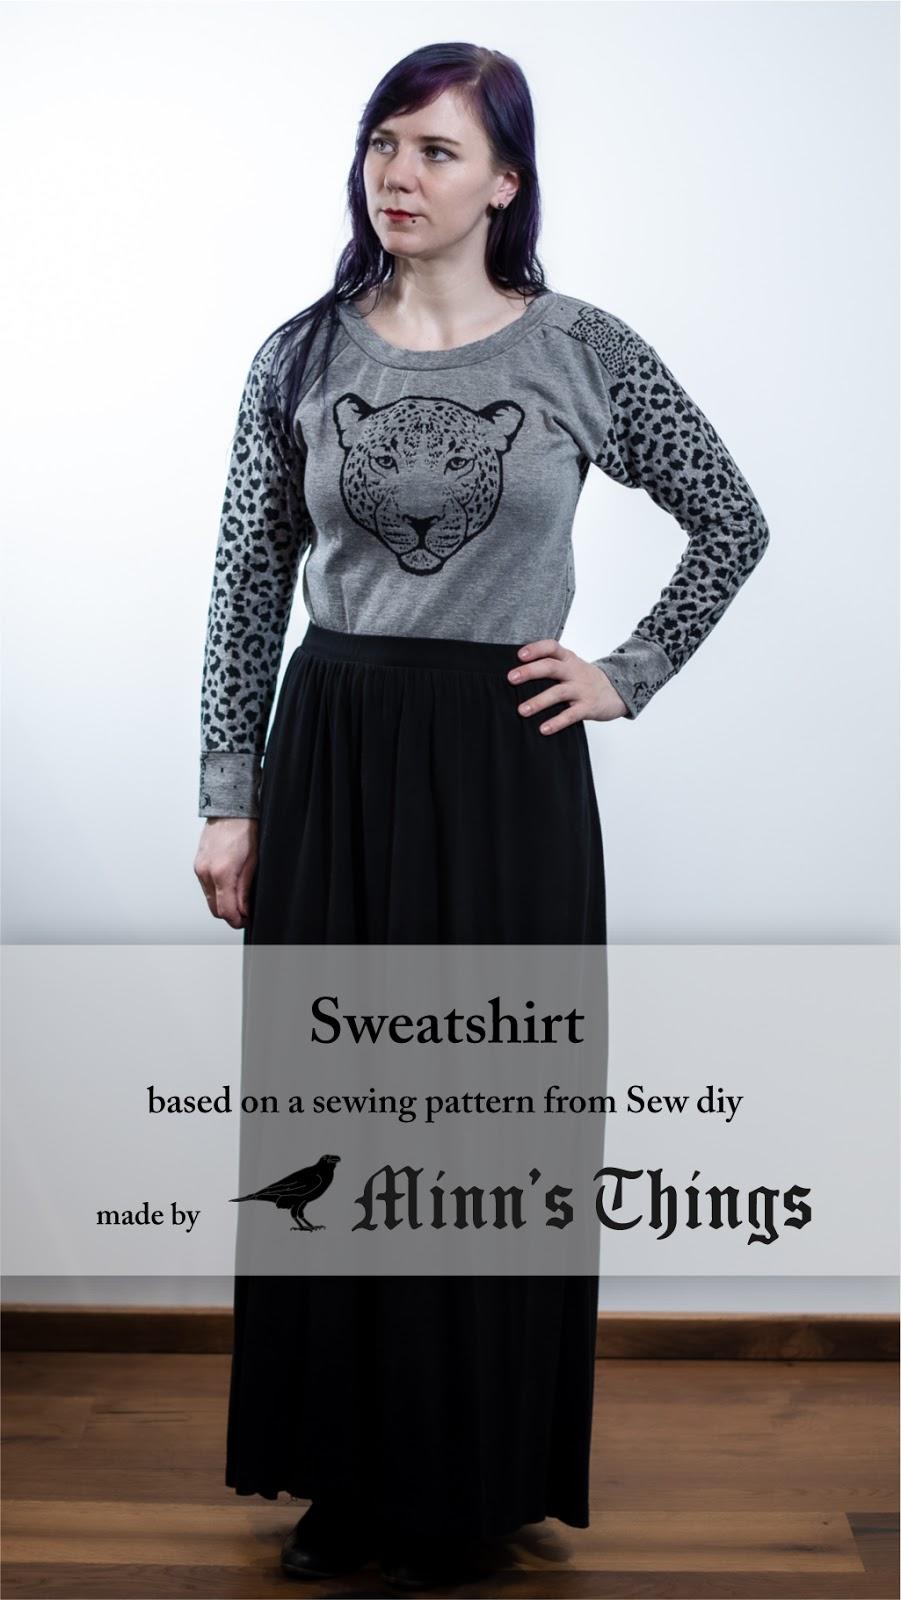 cheetah fabric sweatshirt selfdrafted modified sewing pattern Minn's Things Pinterest